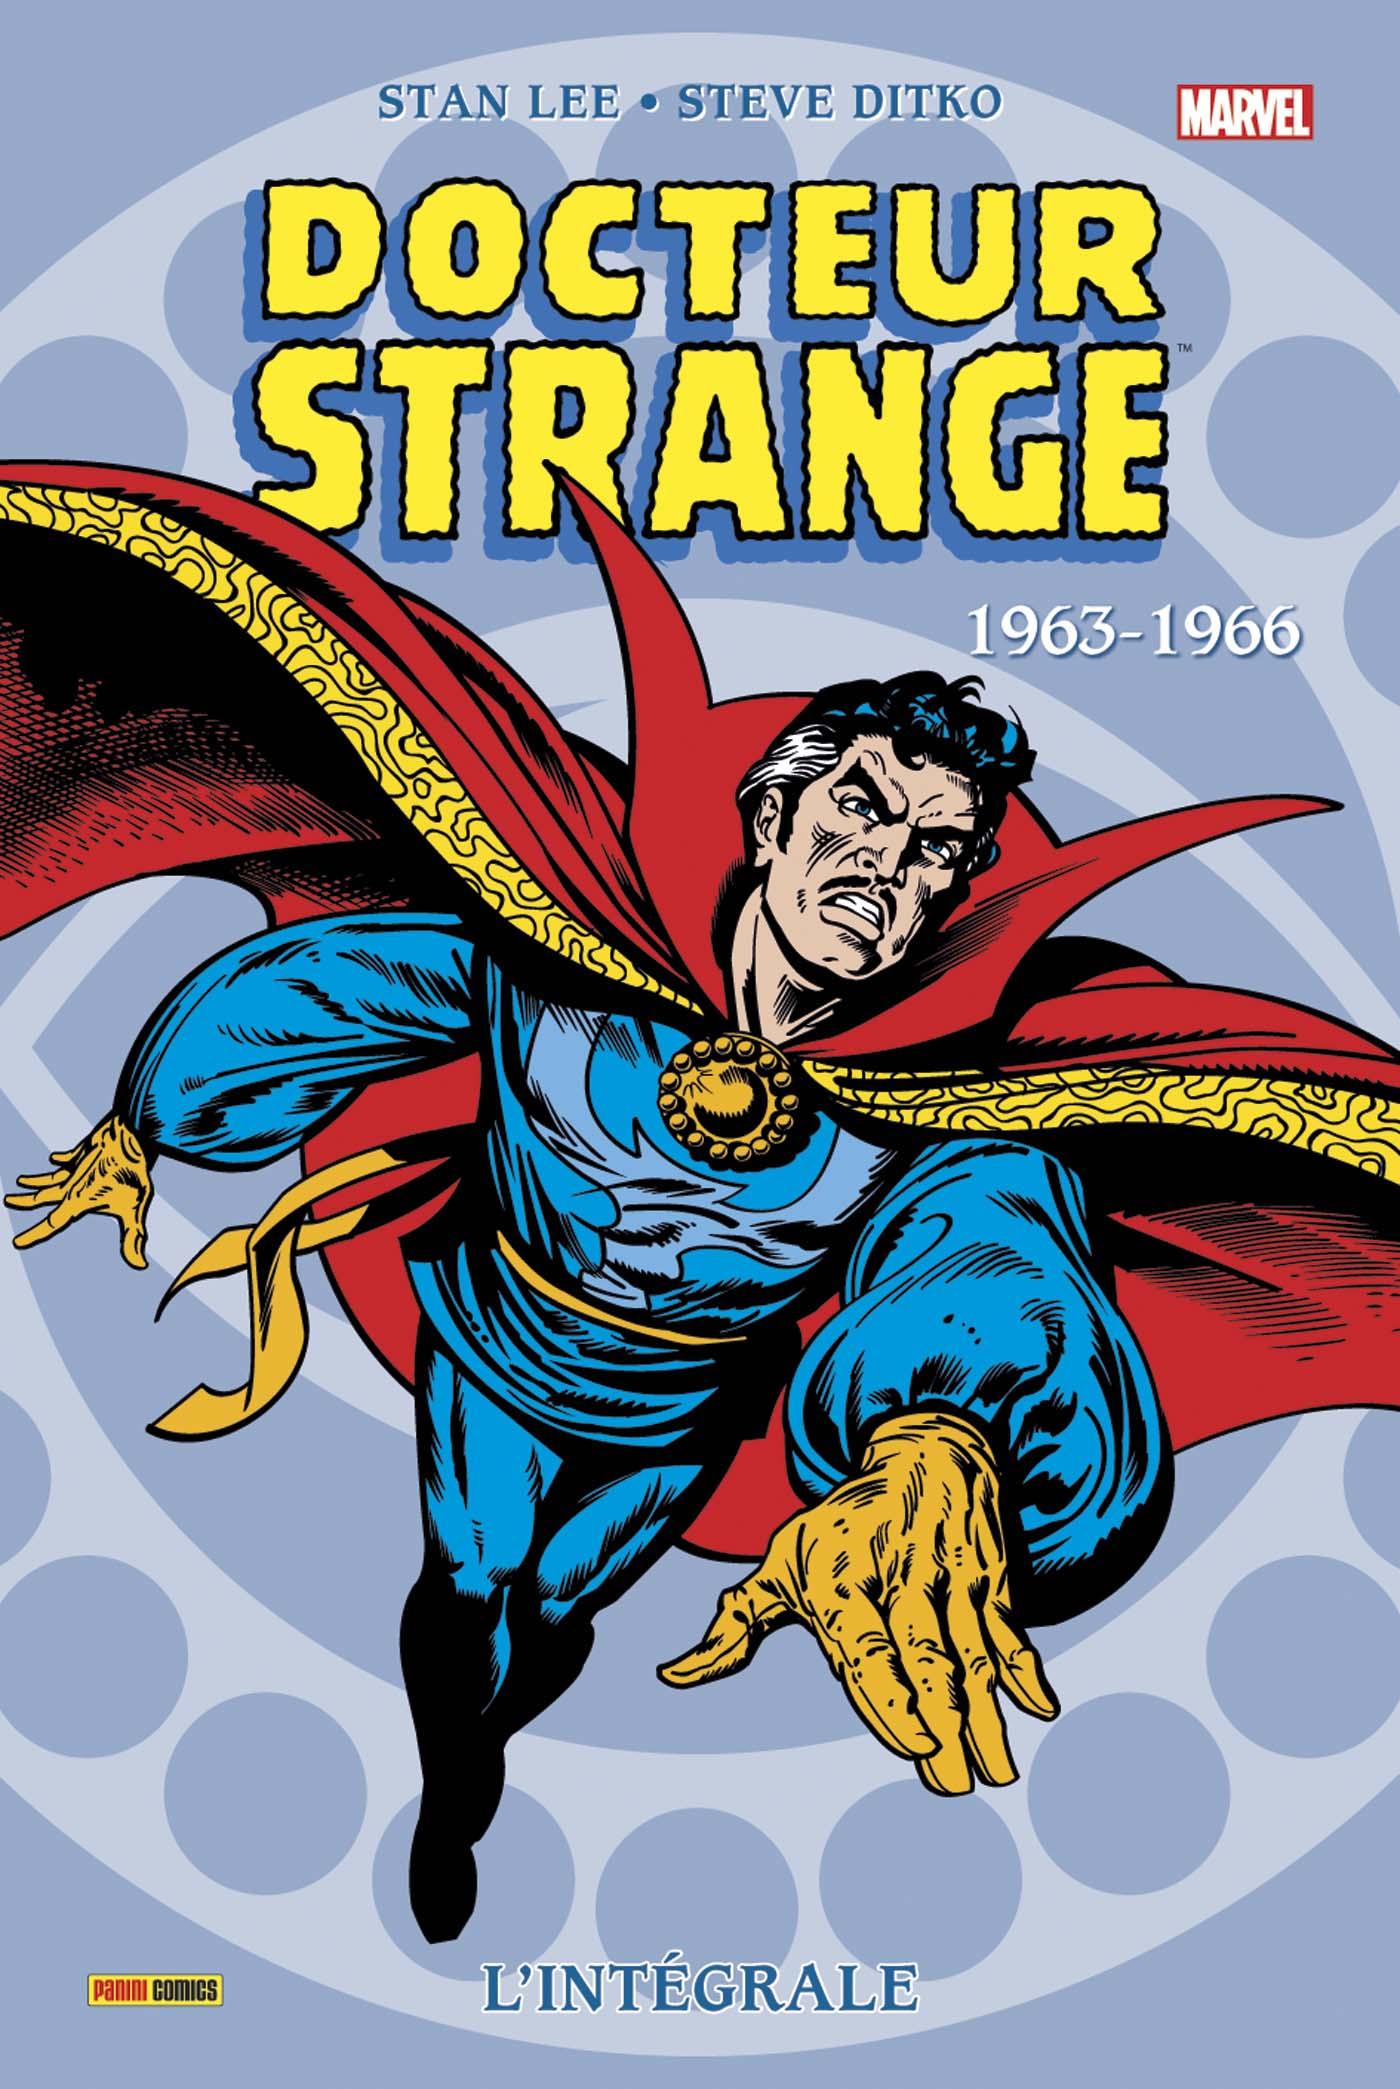 Docteur Strange 1963 - 1963-66